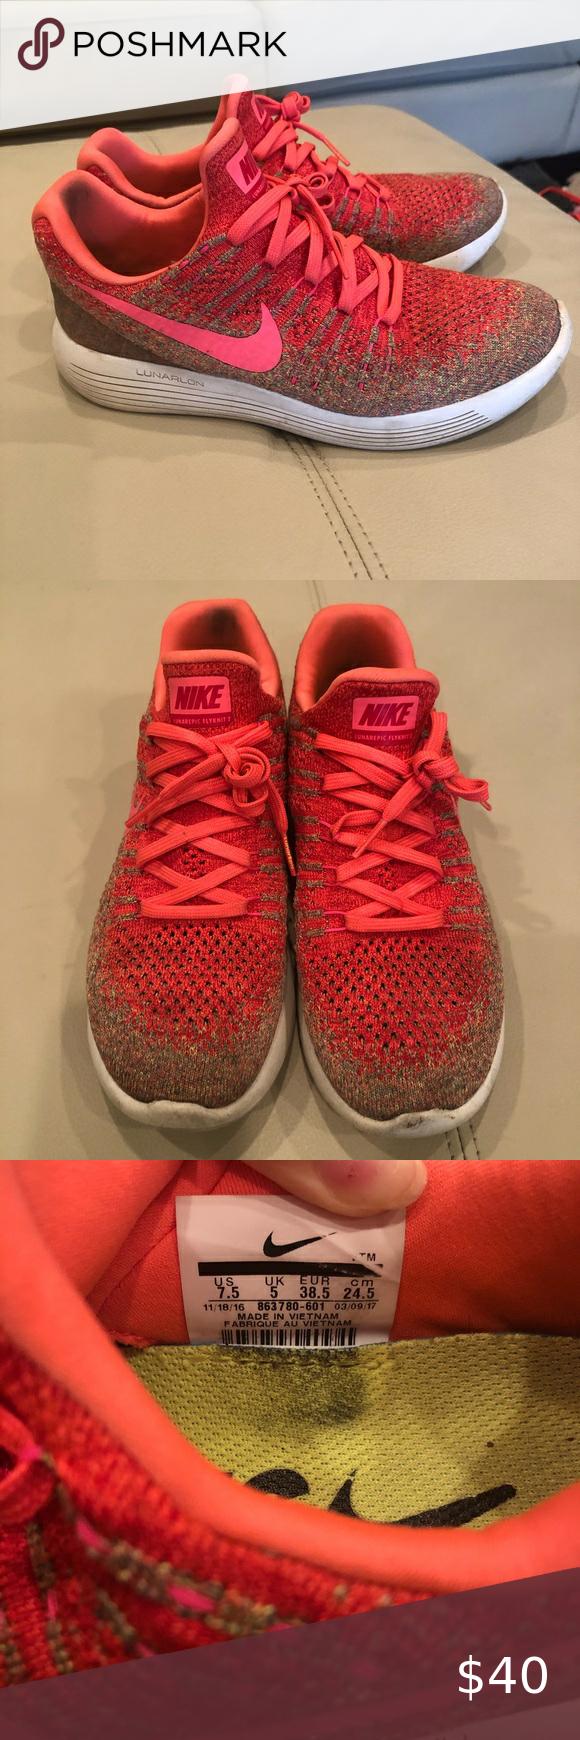 Nike lunarlon sneakers in 2020